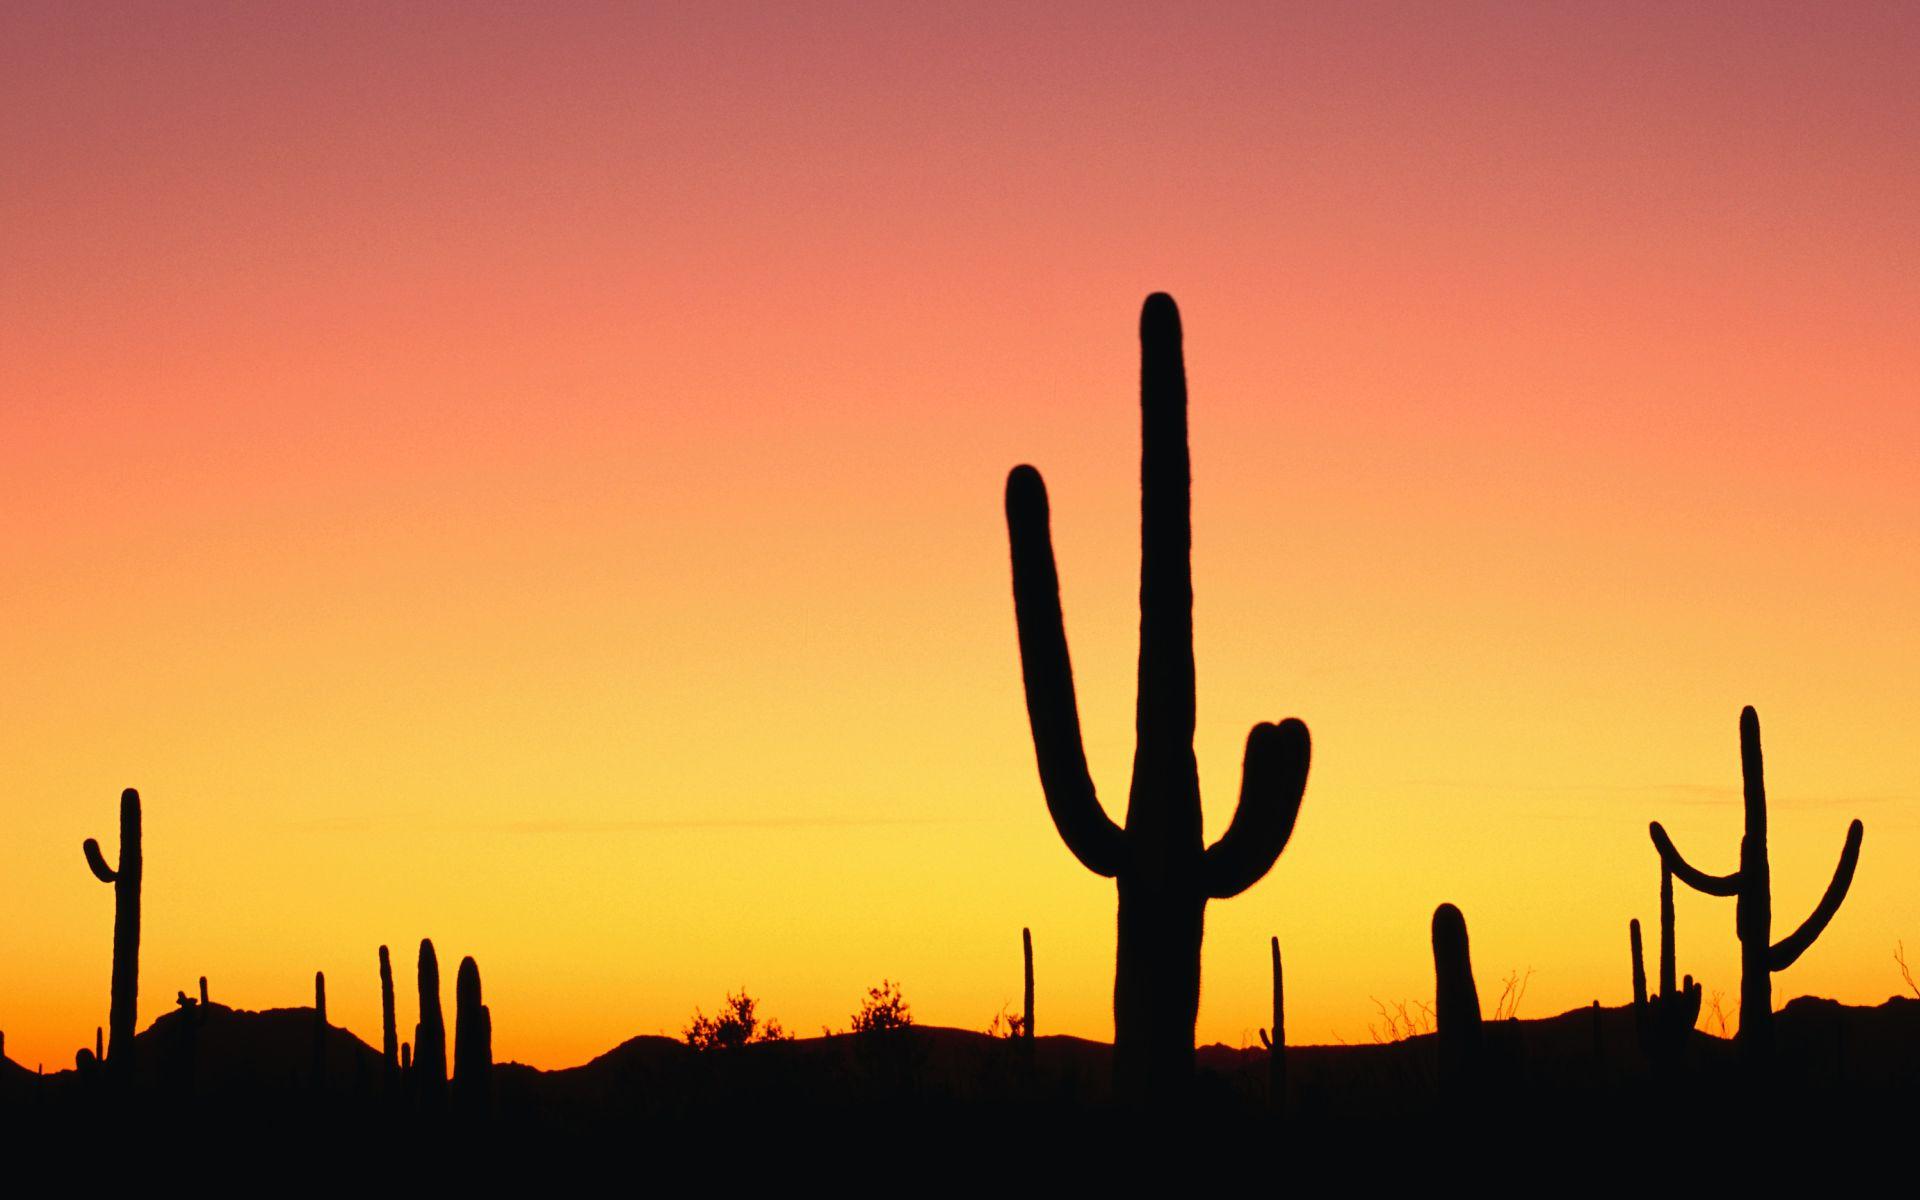 Arizona Sunset Wallpaper 30130